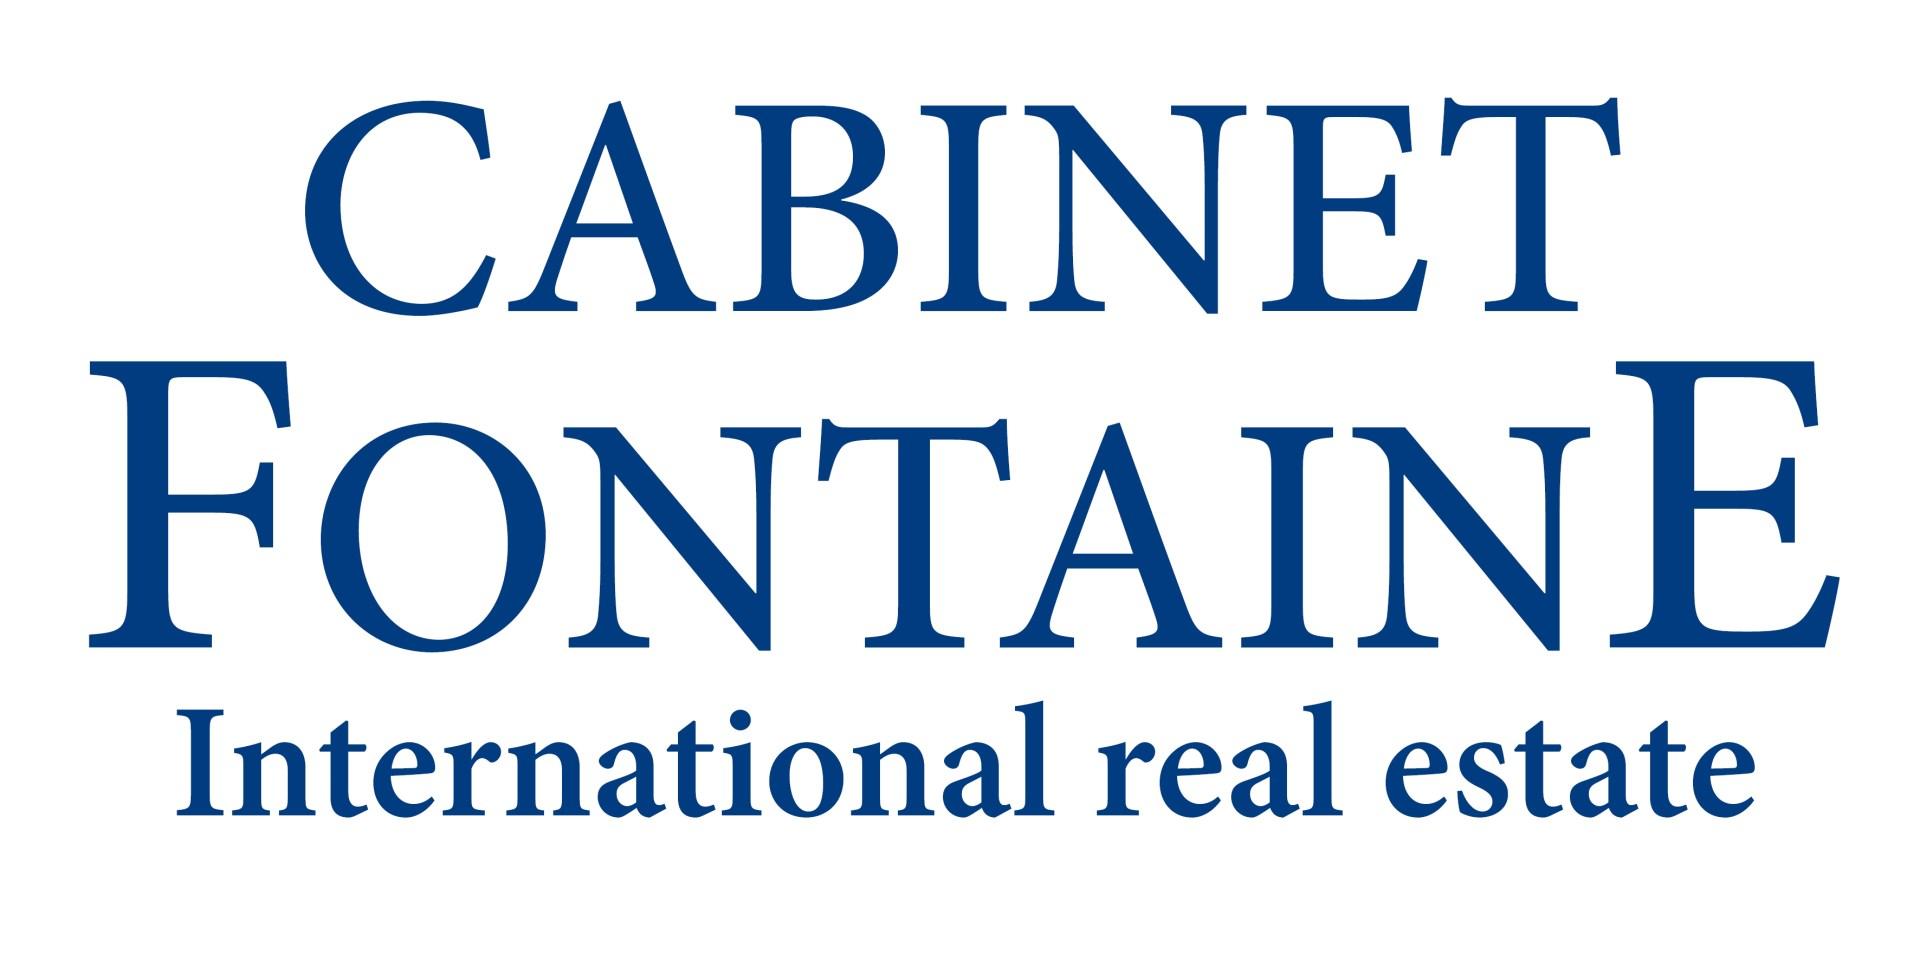 Real estate agency CABINET FONTAINE in Paris 8ème